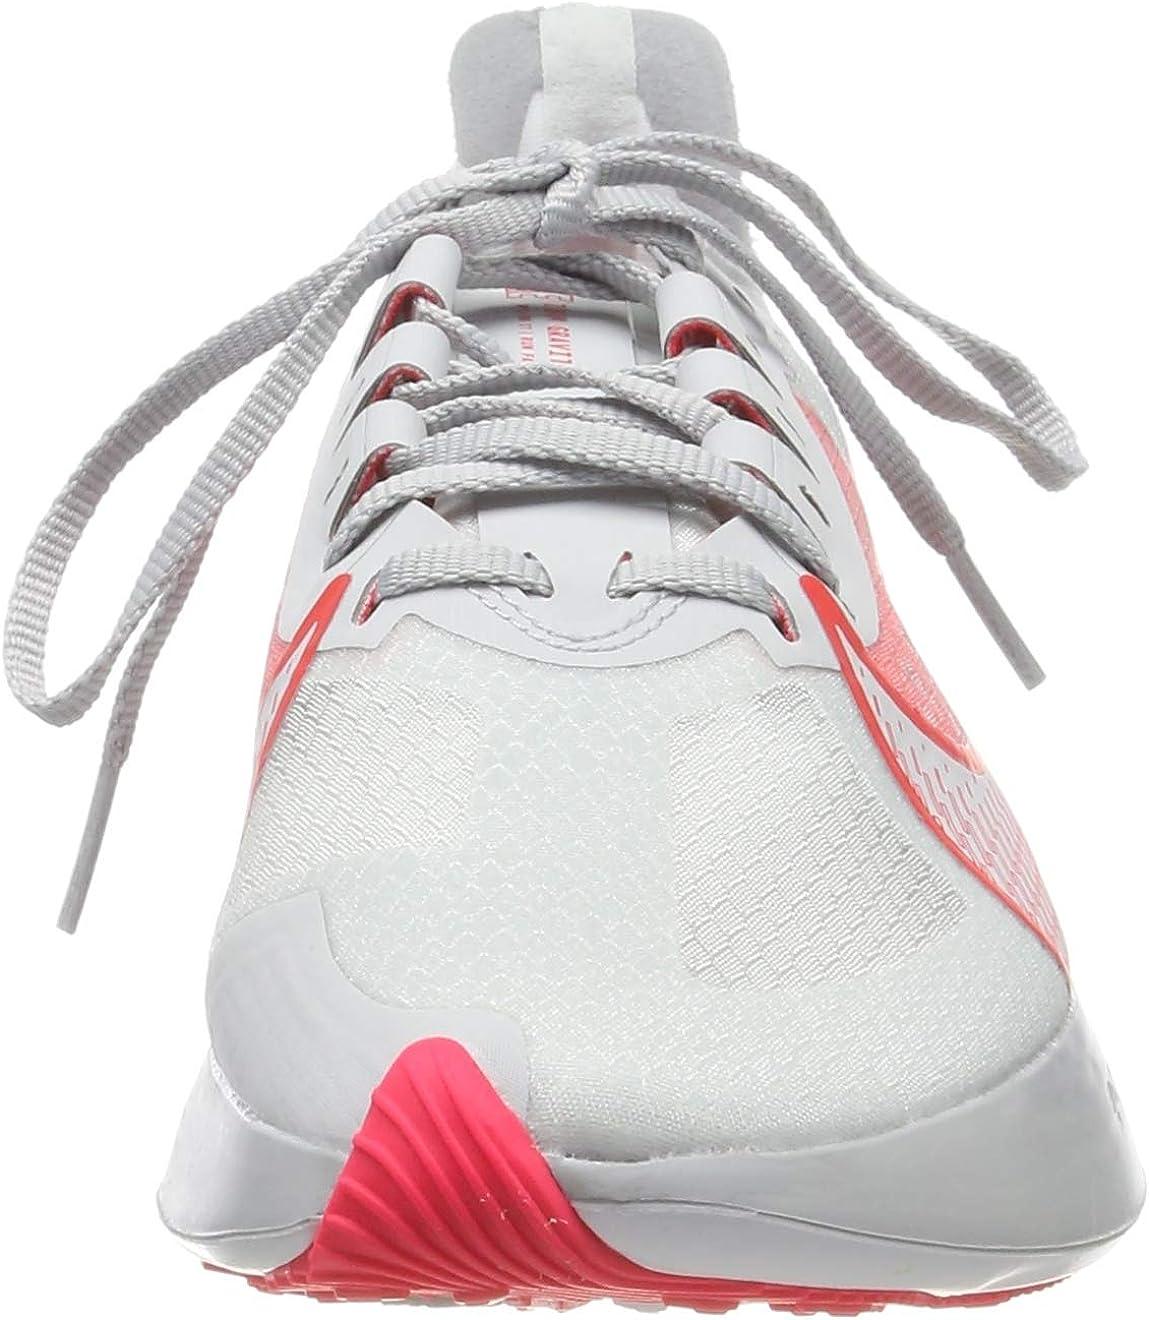 Chaussures de Running Femme Nike Zoom Gravity